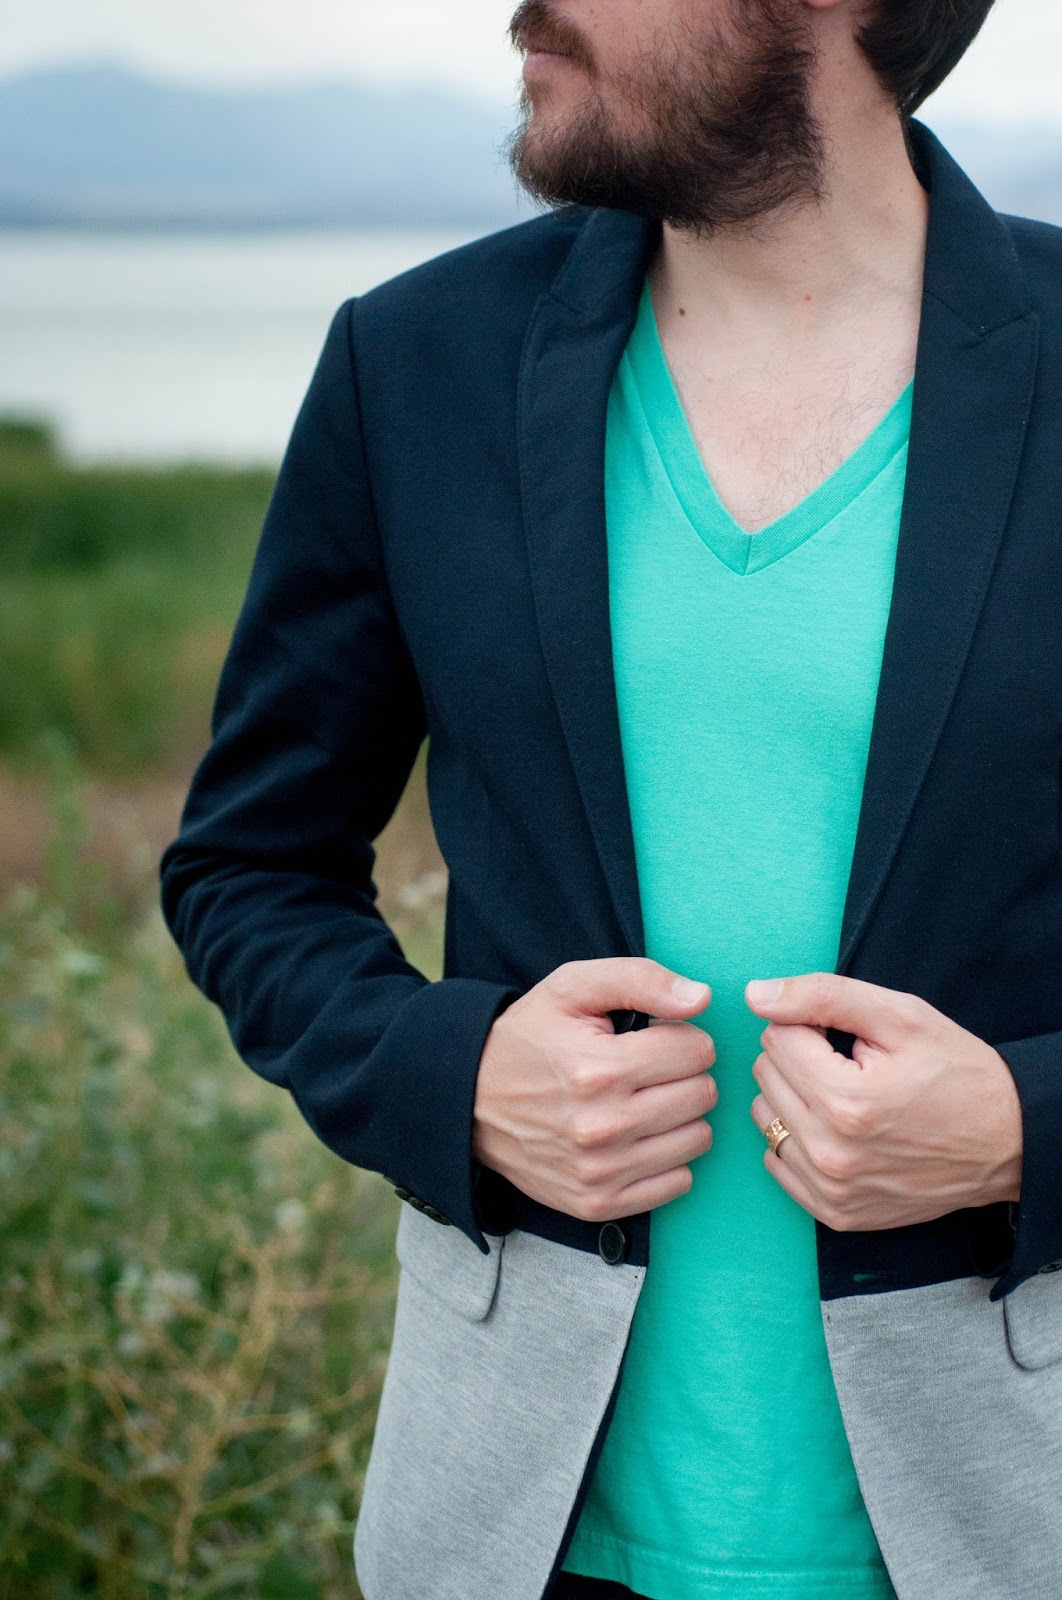 mens ootd, mens fashion blog, mens style blog, american apparel v neck, v neck shirt, zara blazer